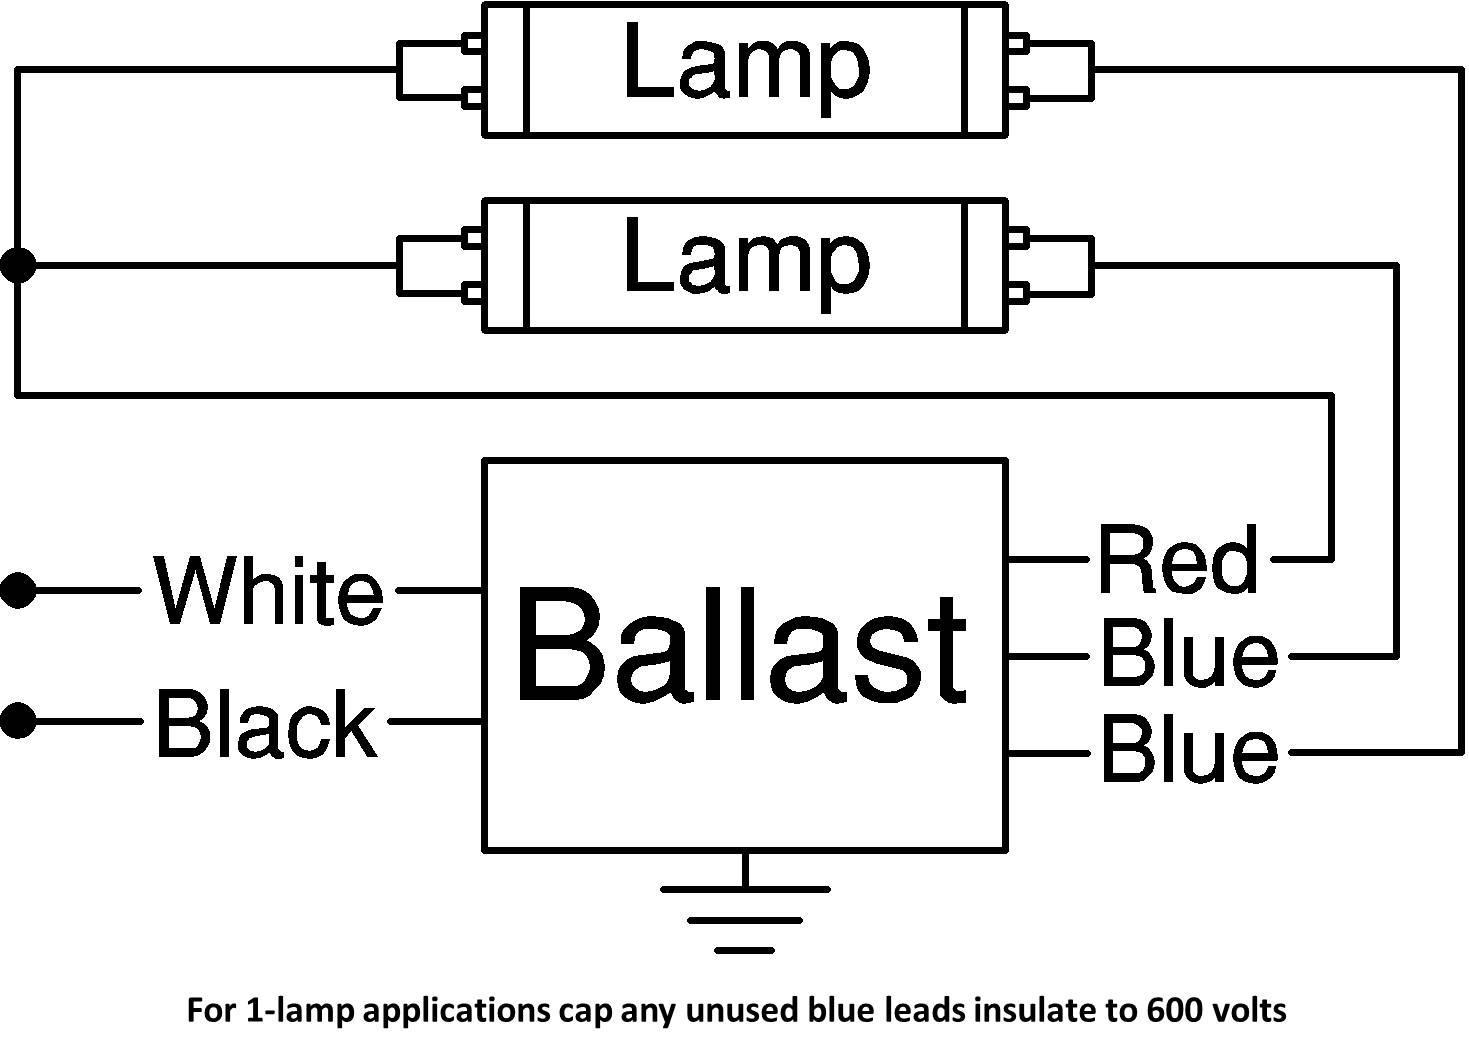 [SCHEMATICS_4LK]  HD_7184] T5Ho Ballast Wiring Diagram Download Diagram   Triad Ballast Wiring Diagram      Eumqu Embo Vish Ungo Sapebe Mohammedshrine Librar Wiring 101